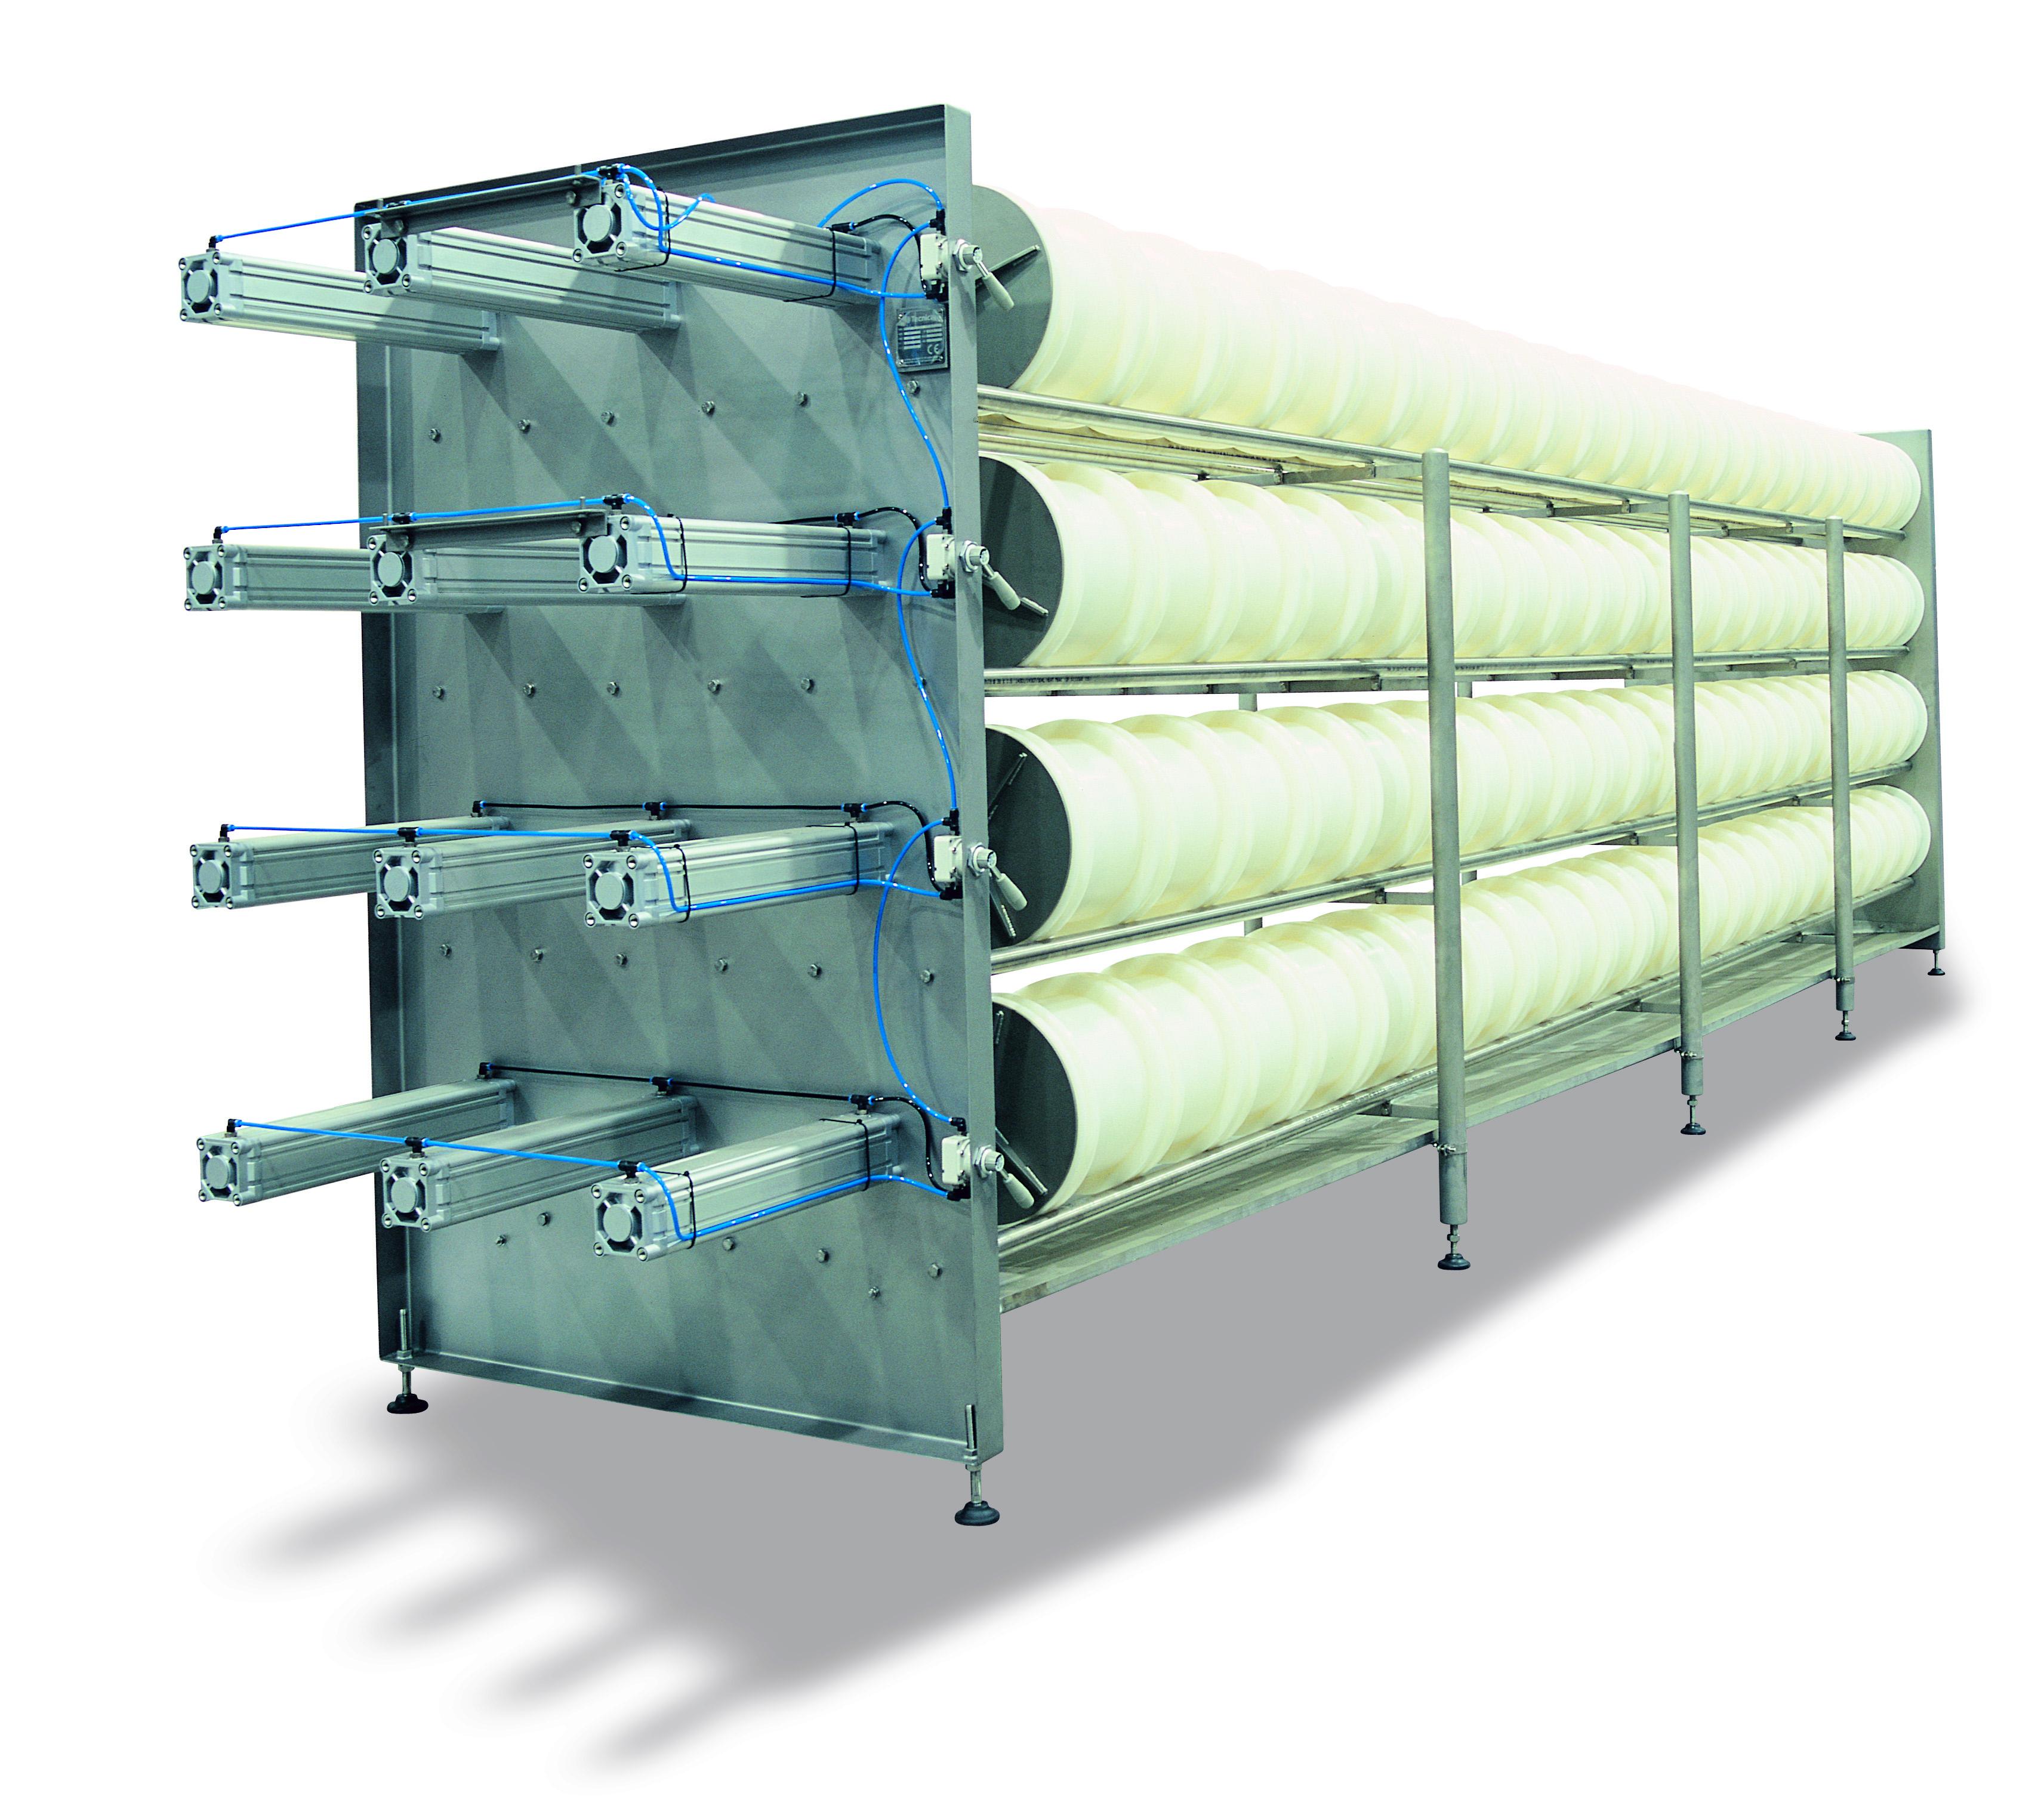 PRENSAPRESS semi-automatic horizontal presses